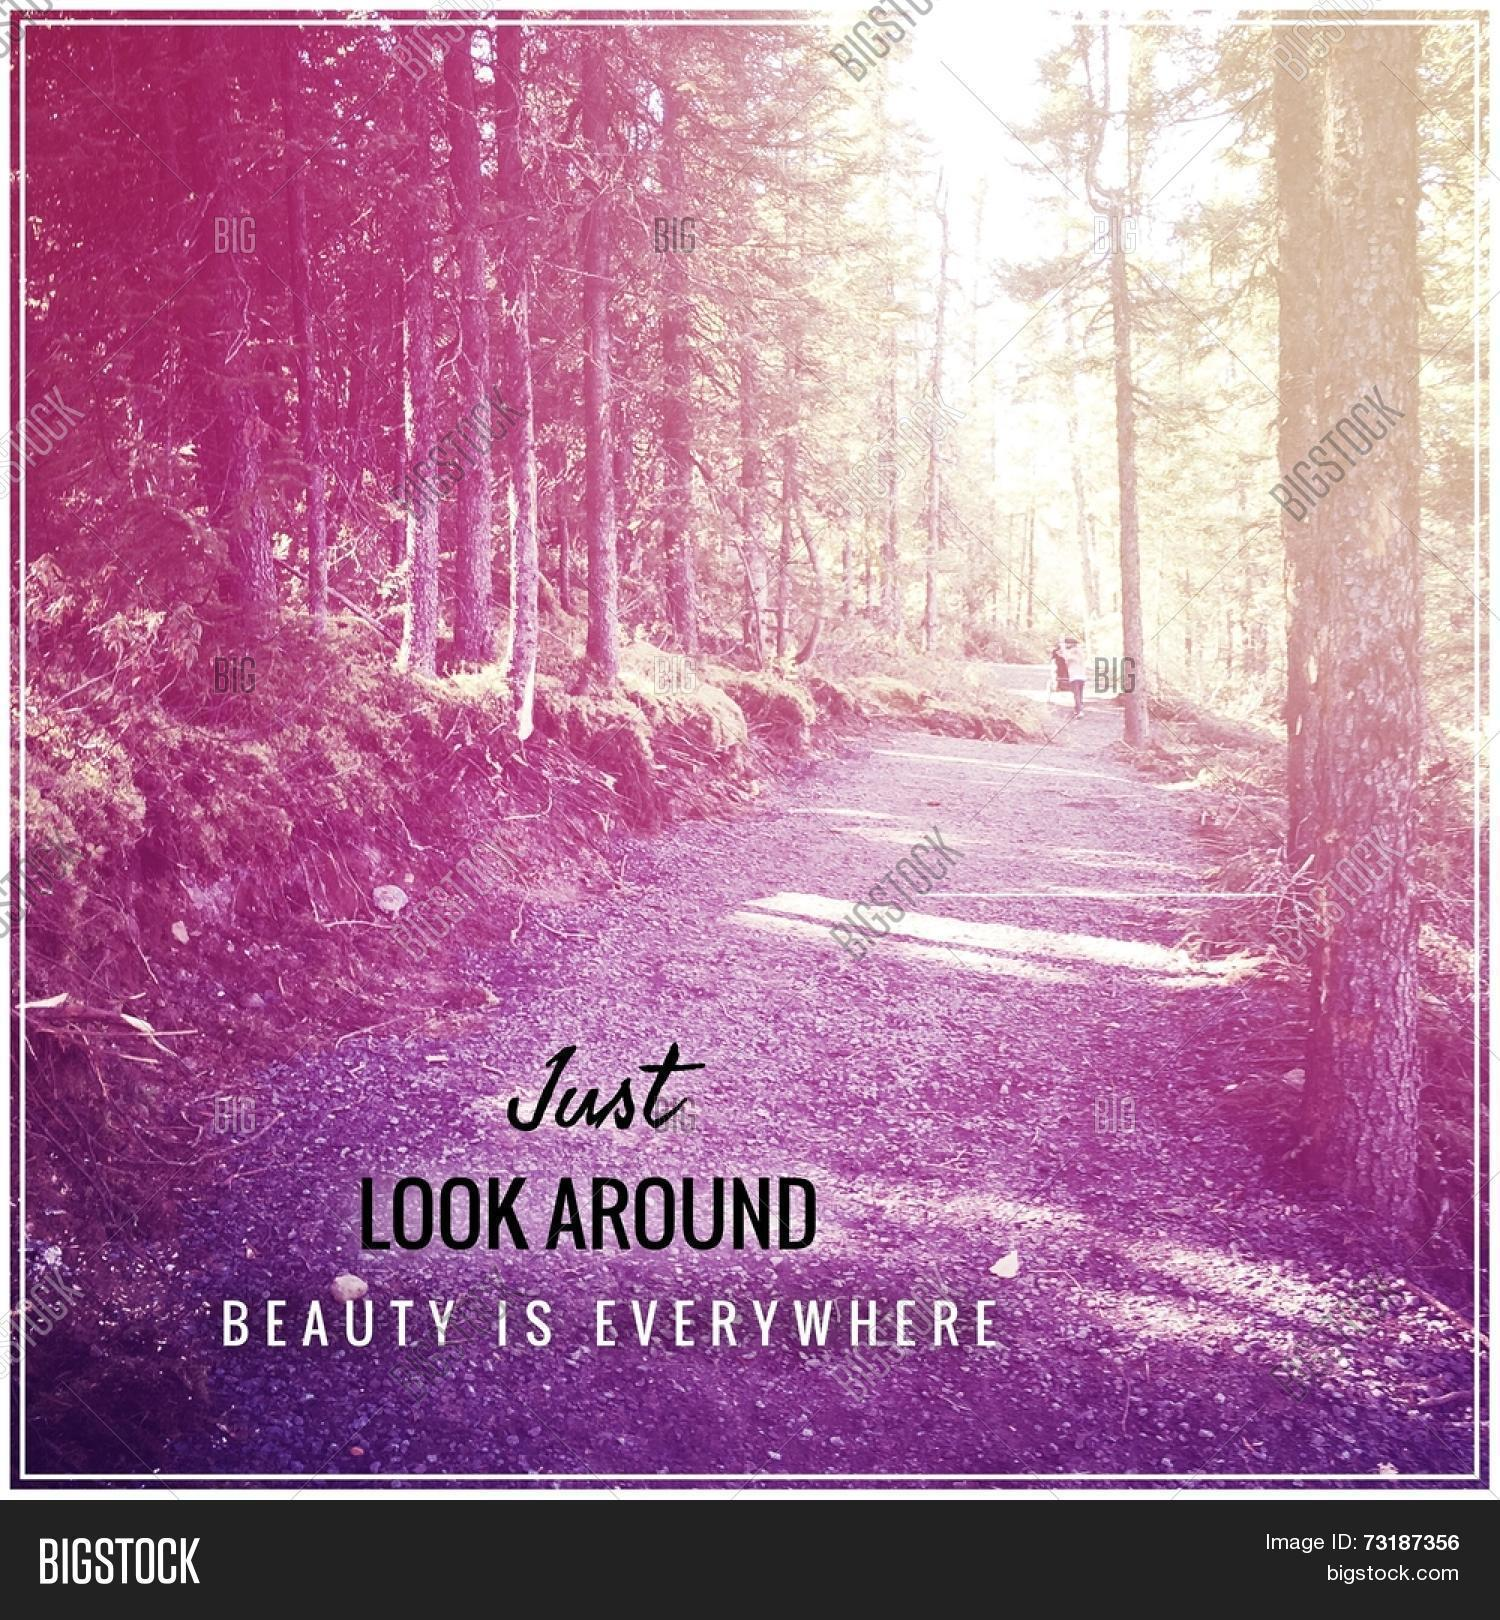 Inspirational Image Photo Free Trial Bigstock